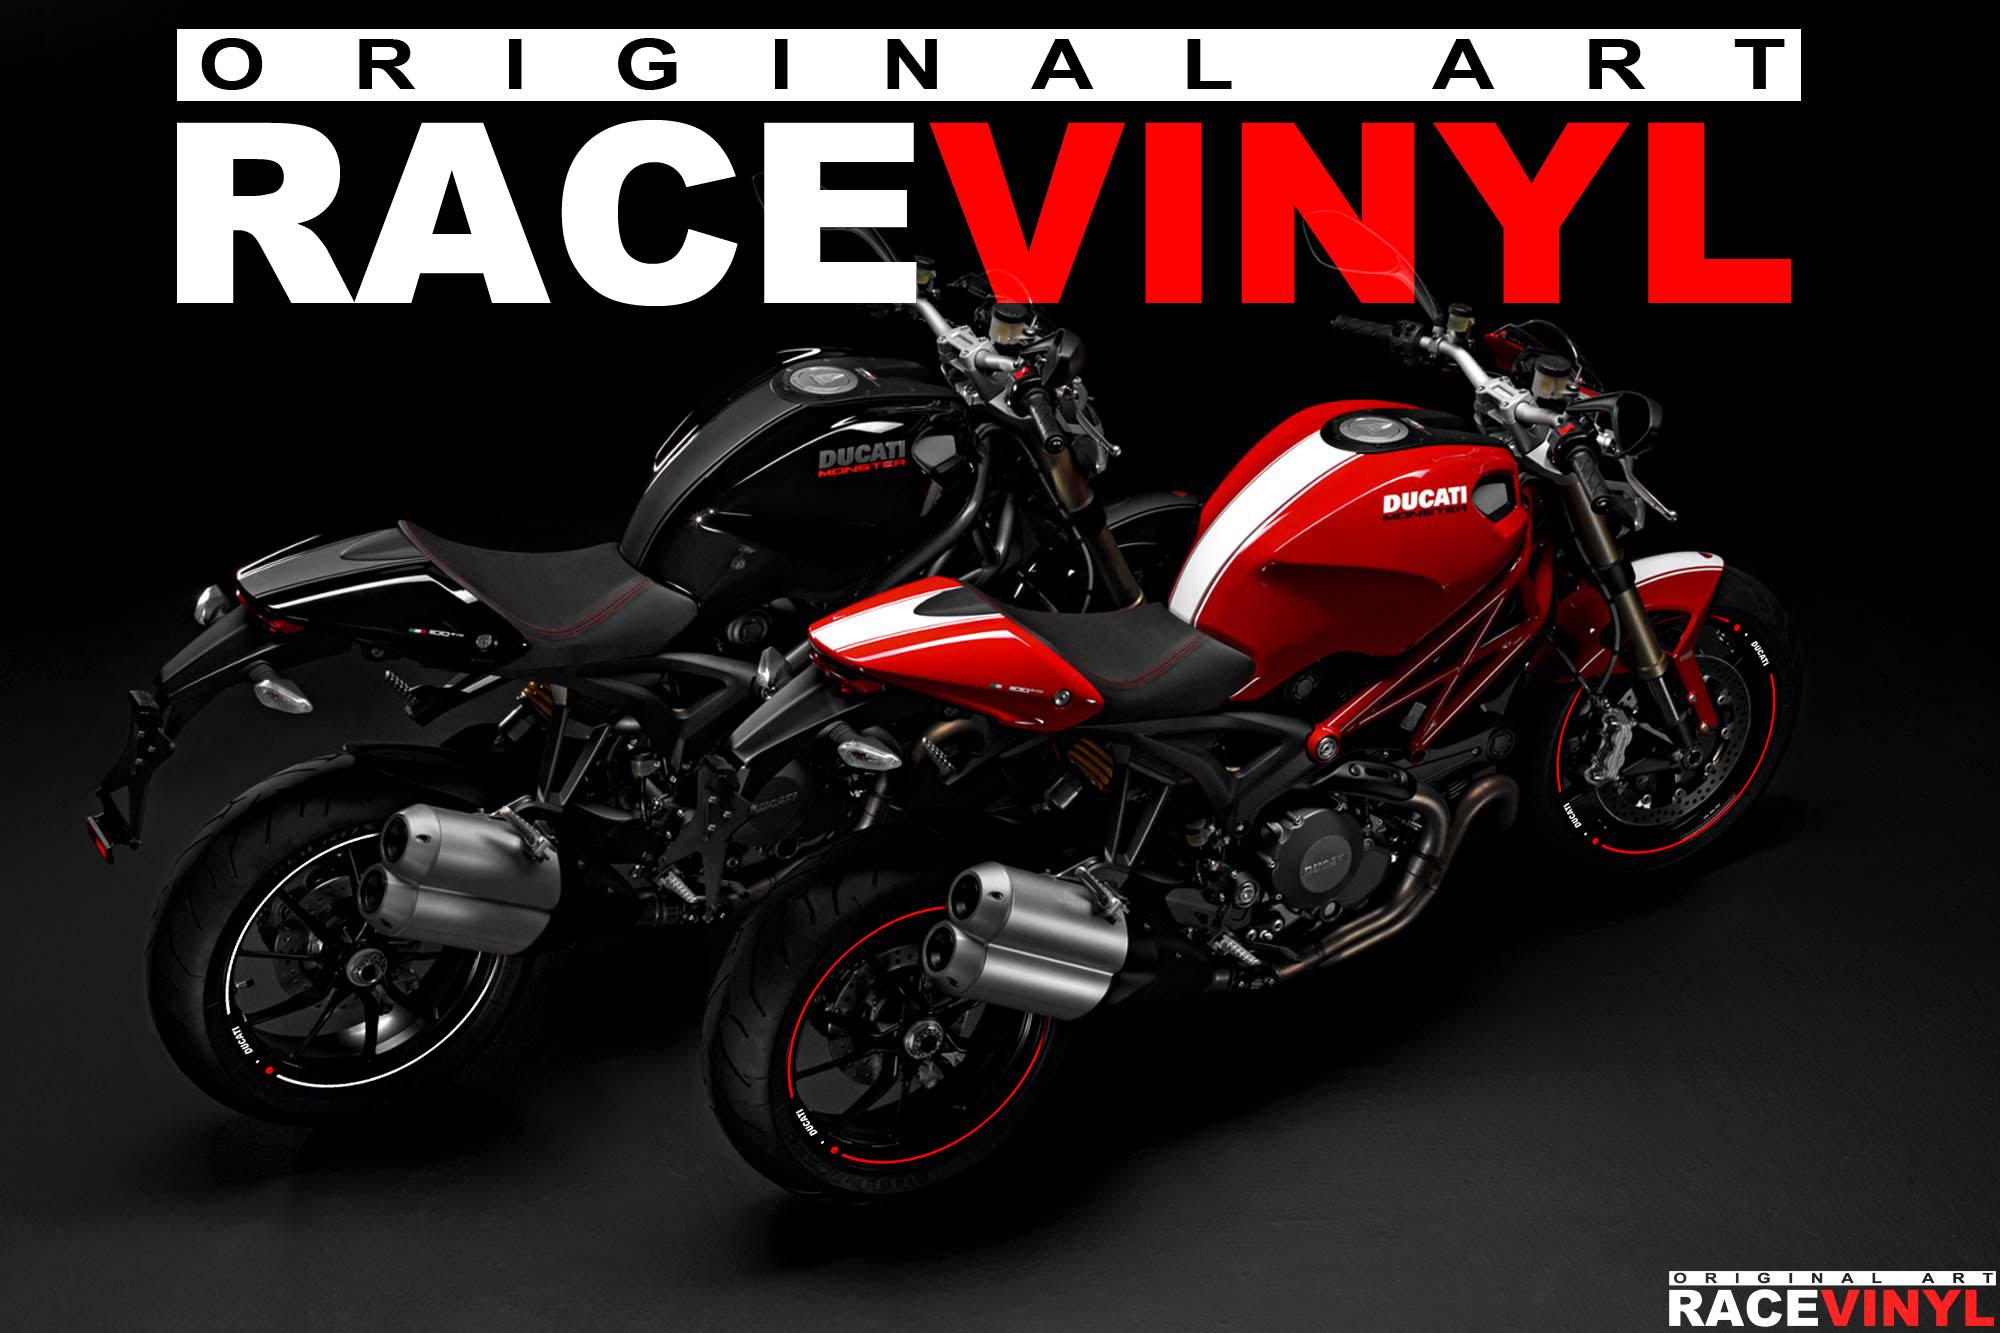 Racevinyl Ducati Monster 400 620 696 659 750 796 800 900 s2r s4r 1000 1100 s r ie evo 1200 pegatina adhesivo rueda llanta vinilo rim sticker stripe vinyl wheel 03